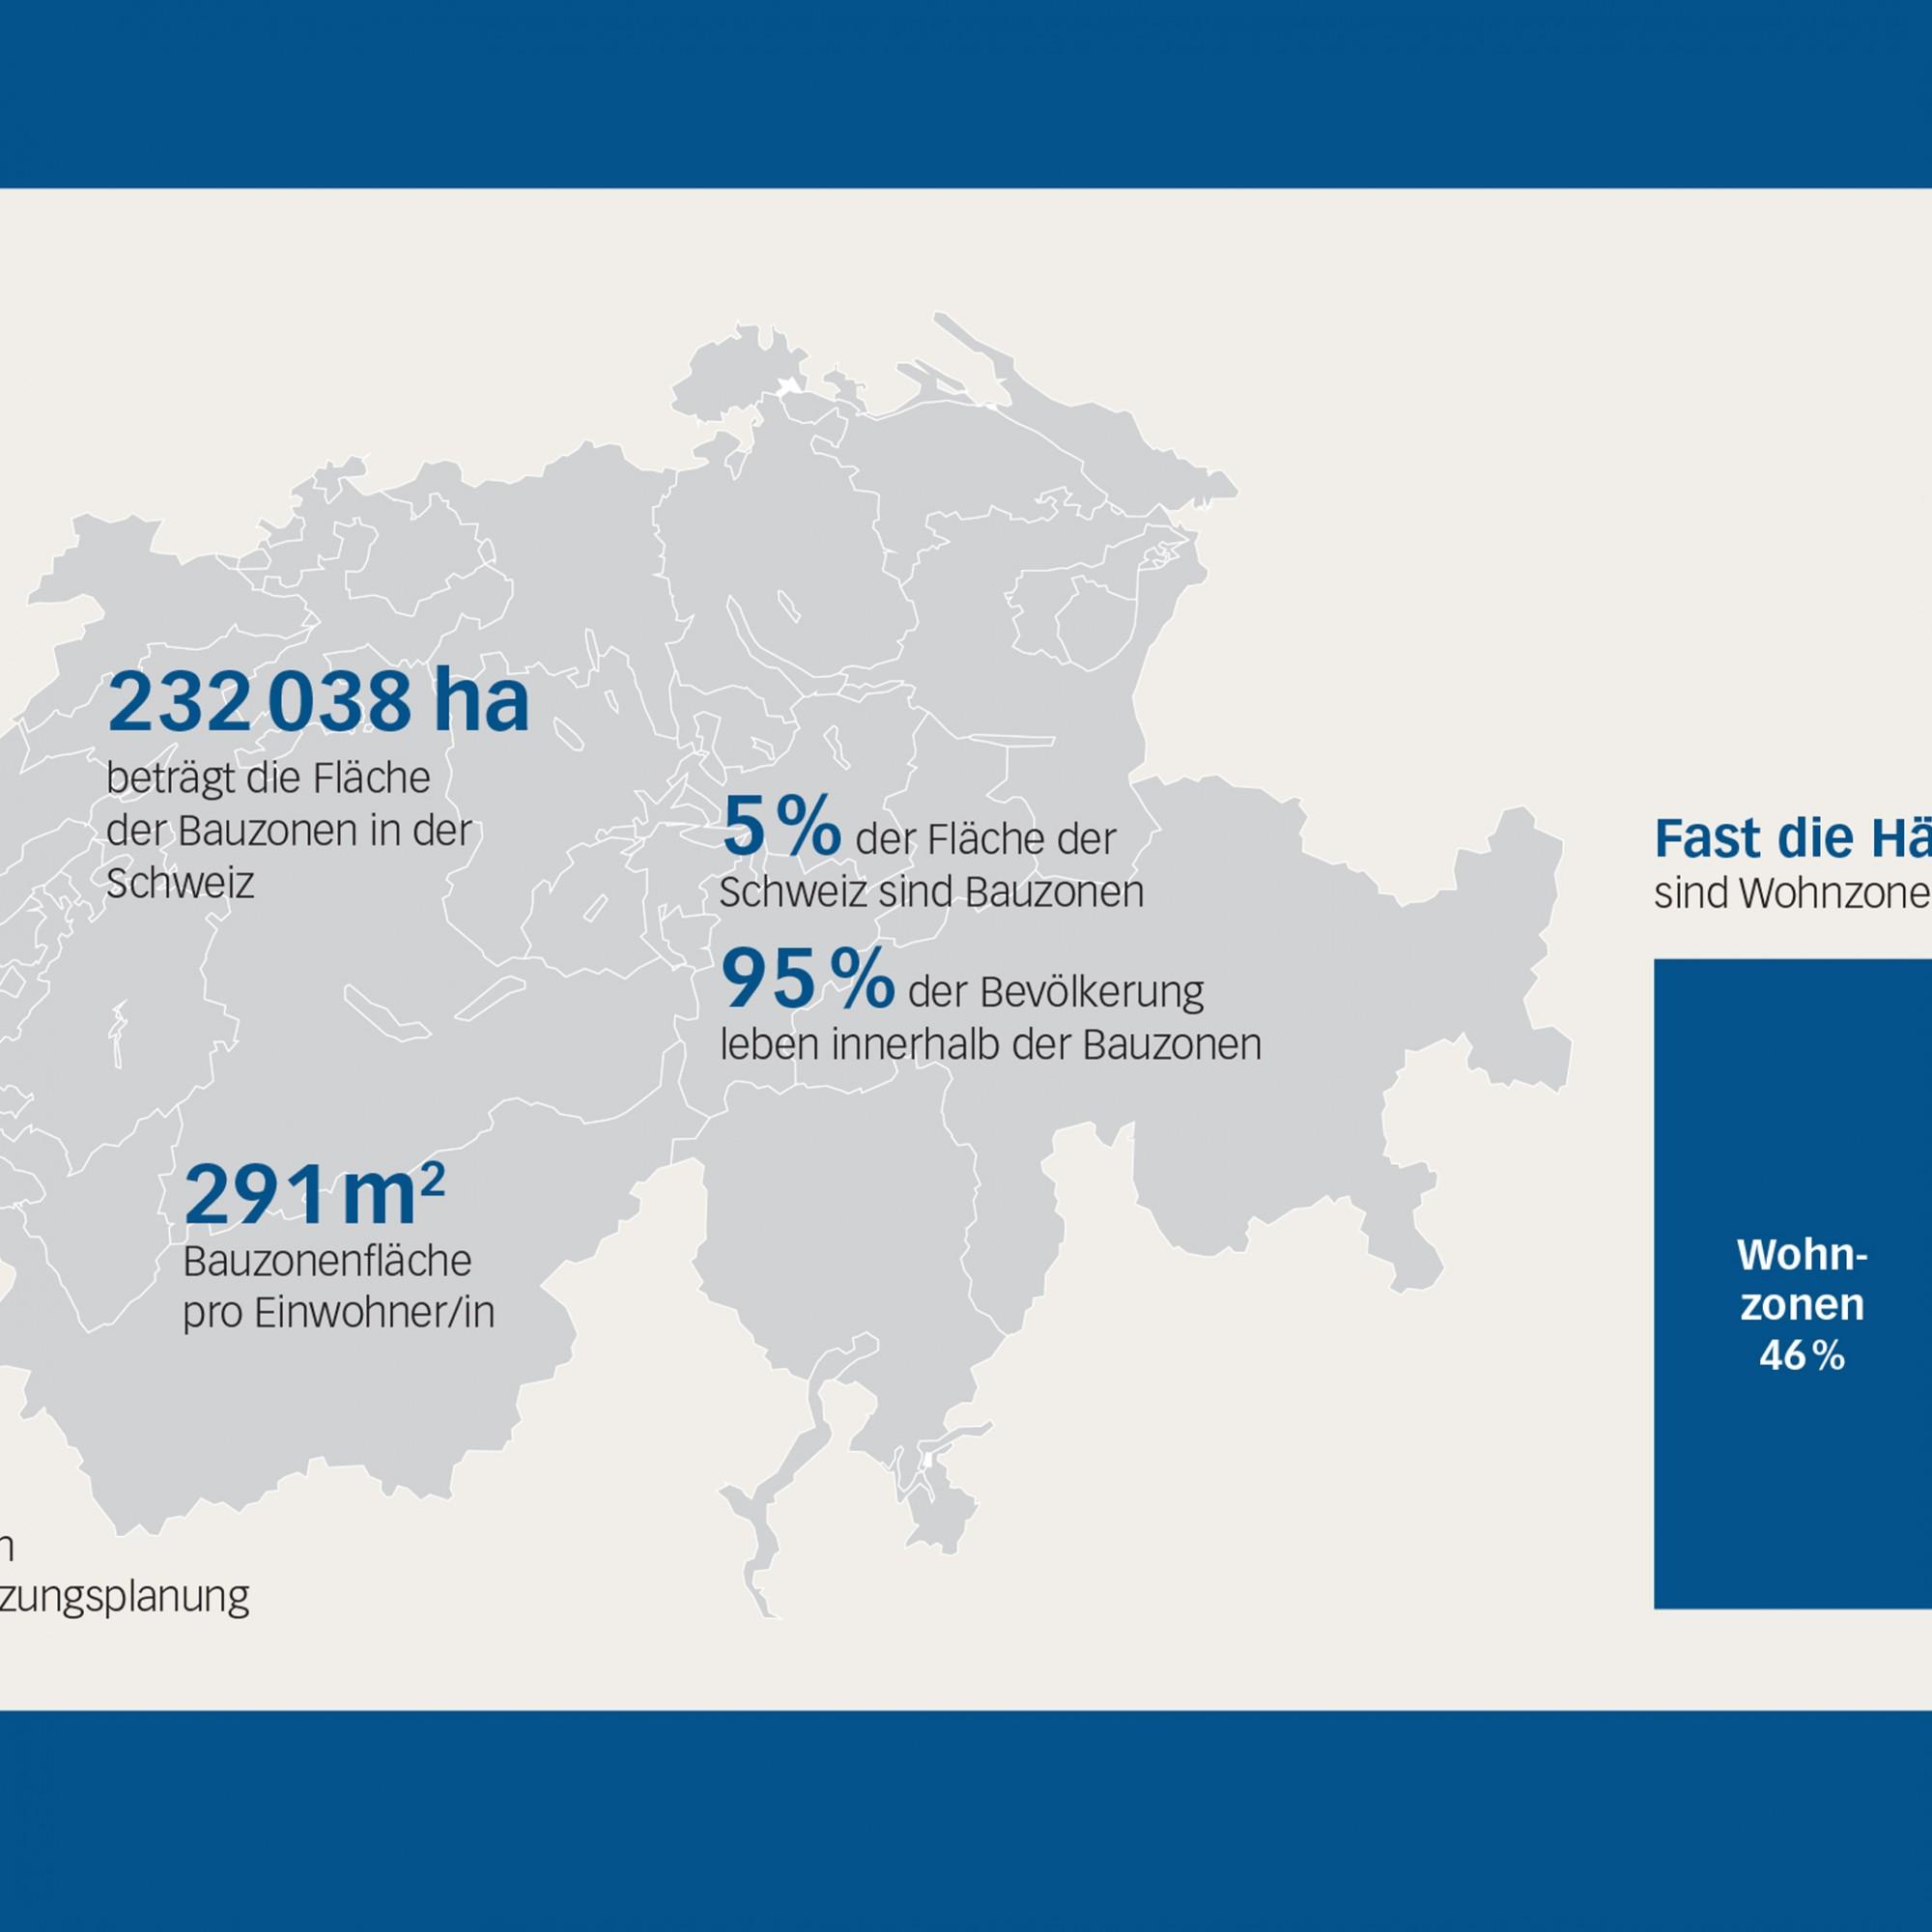 Bauzonenstatistik Schweiz 2017 Überblick.